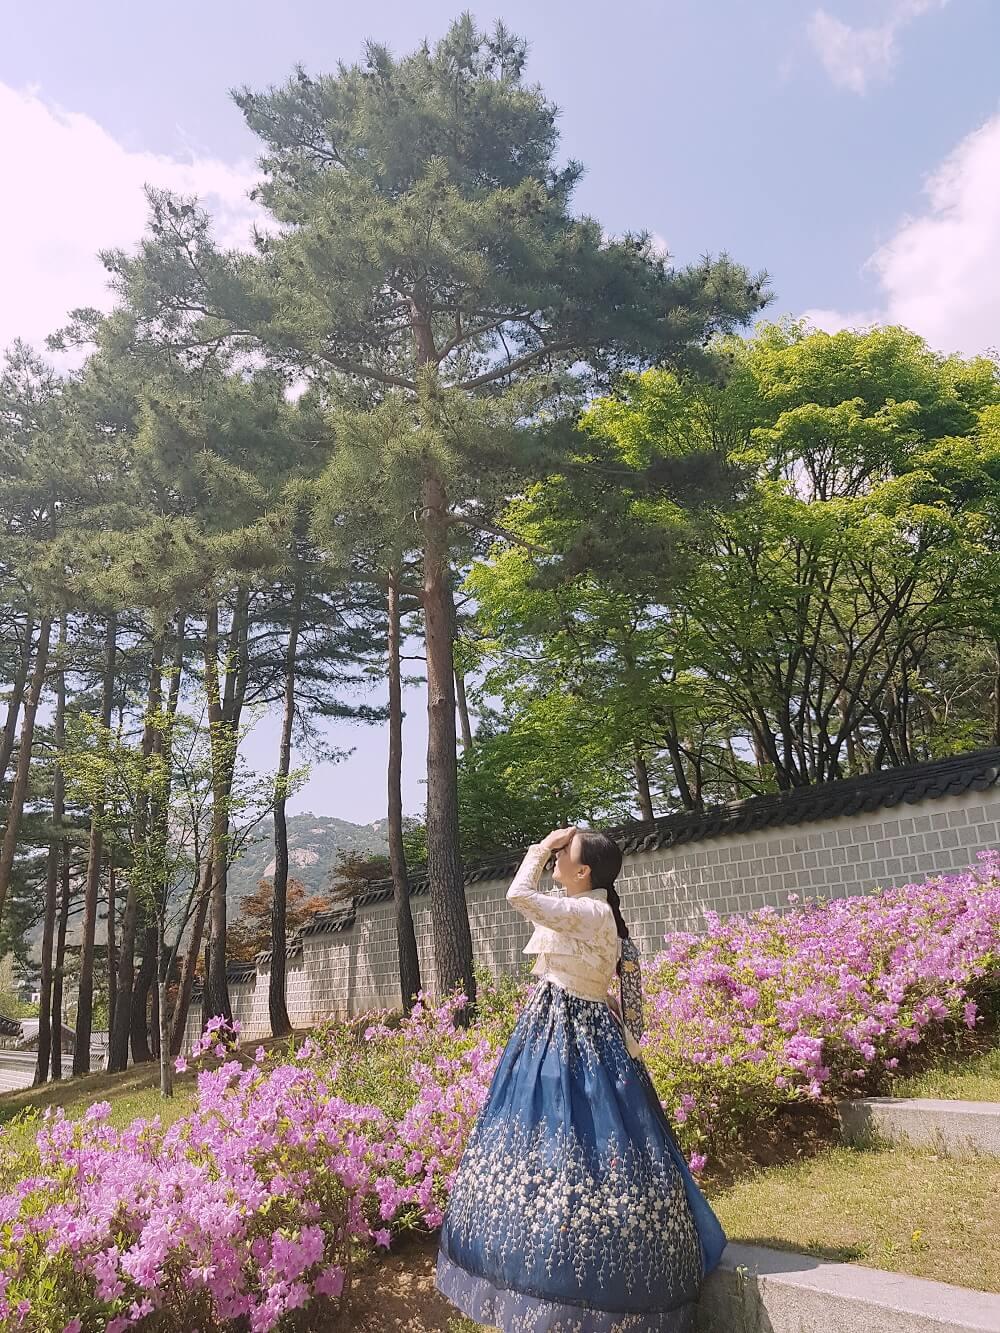 almost summer in gyeongbokgung